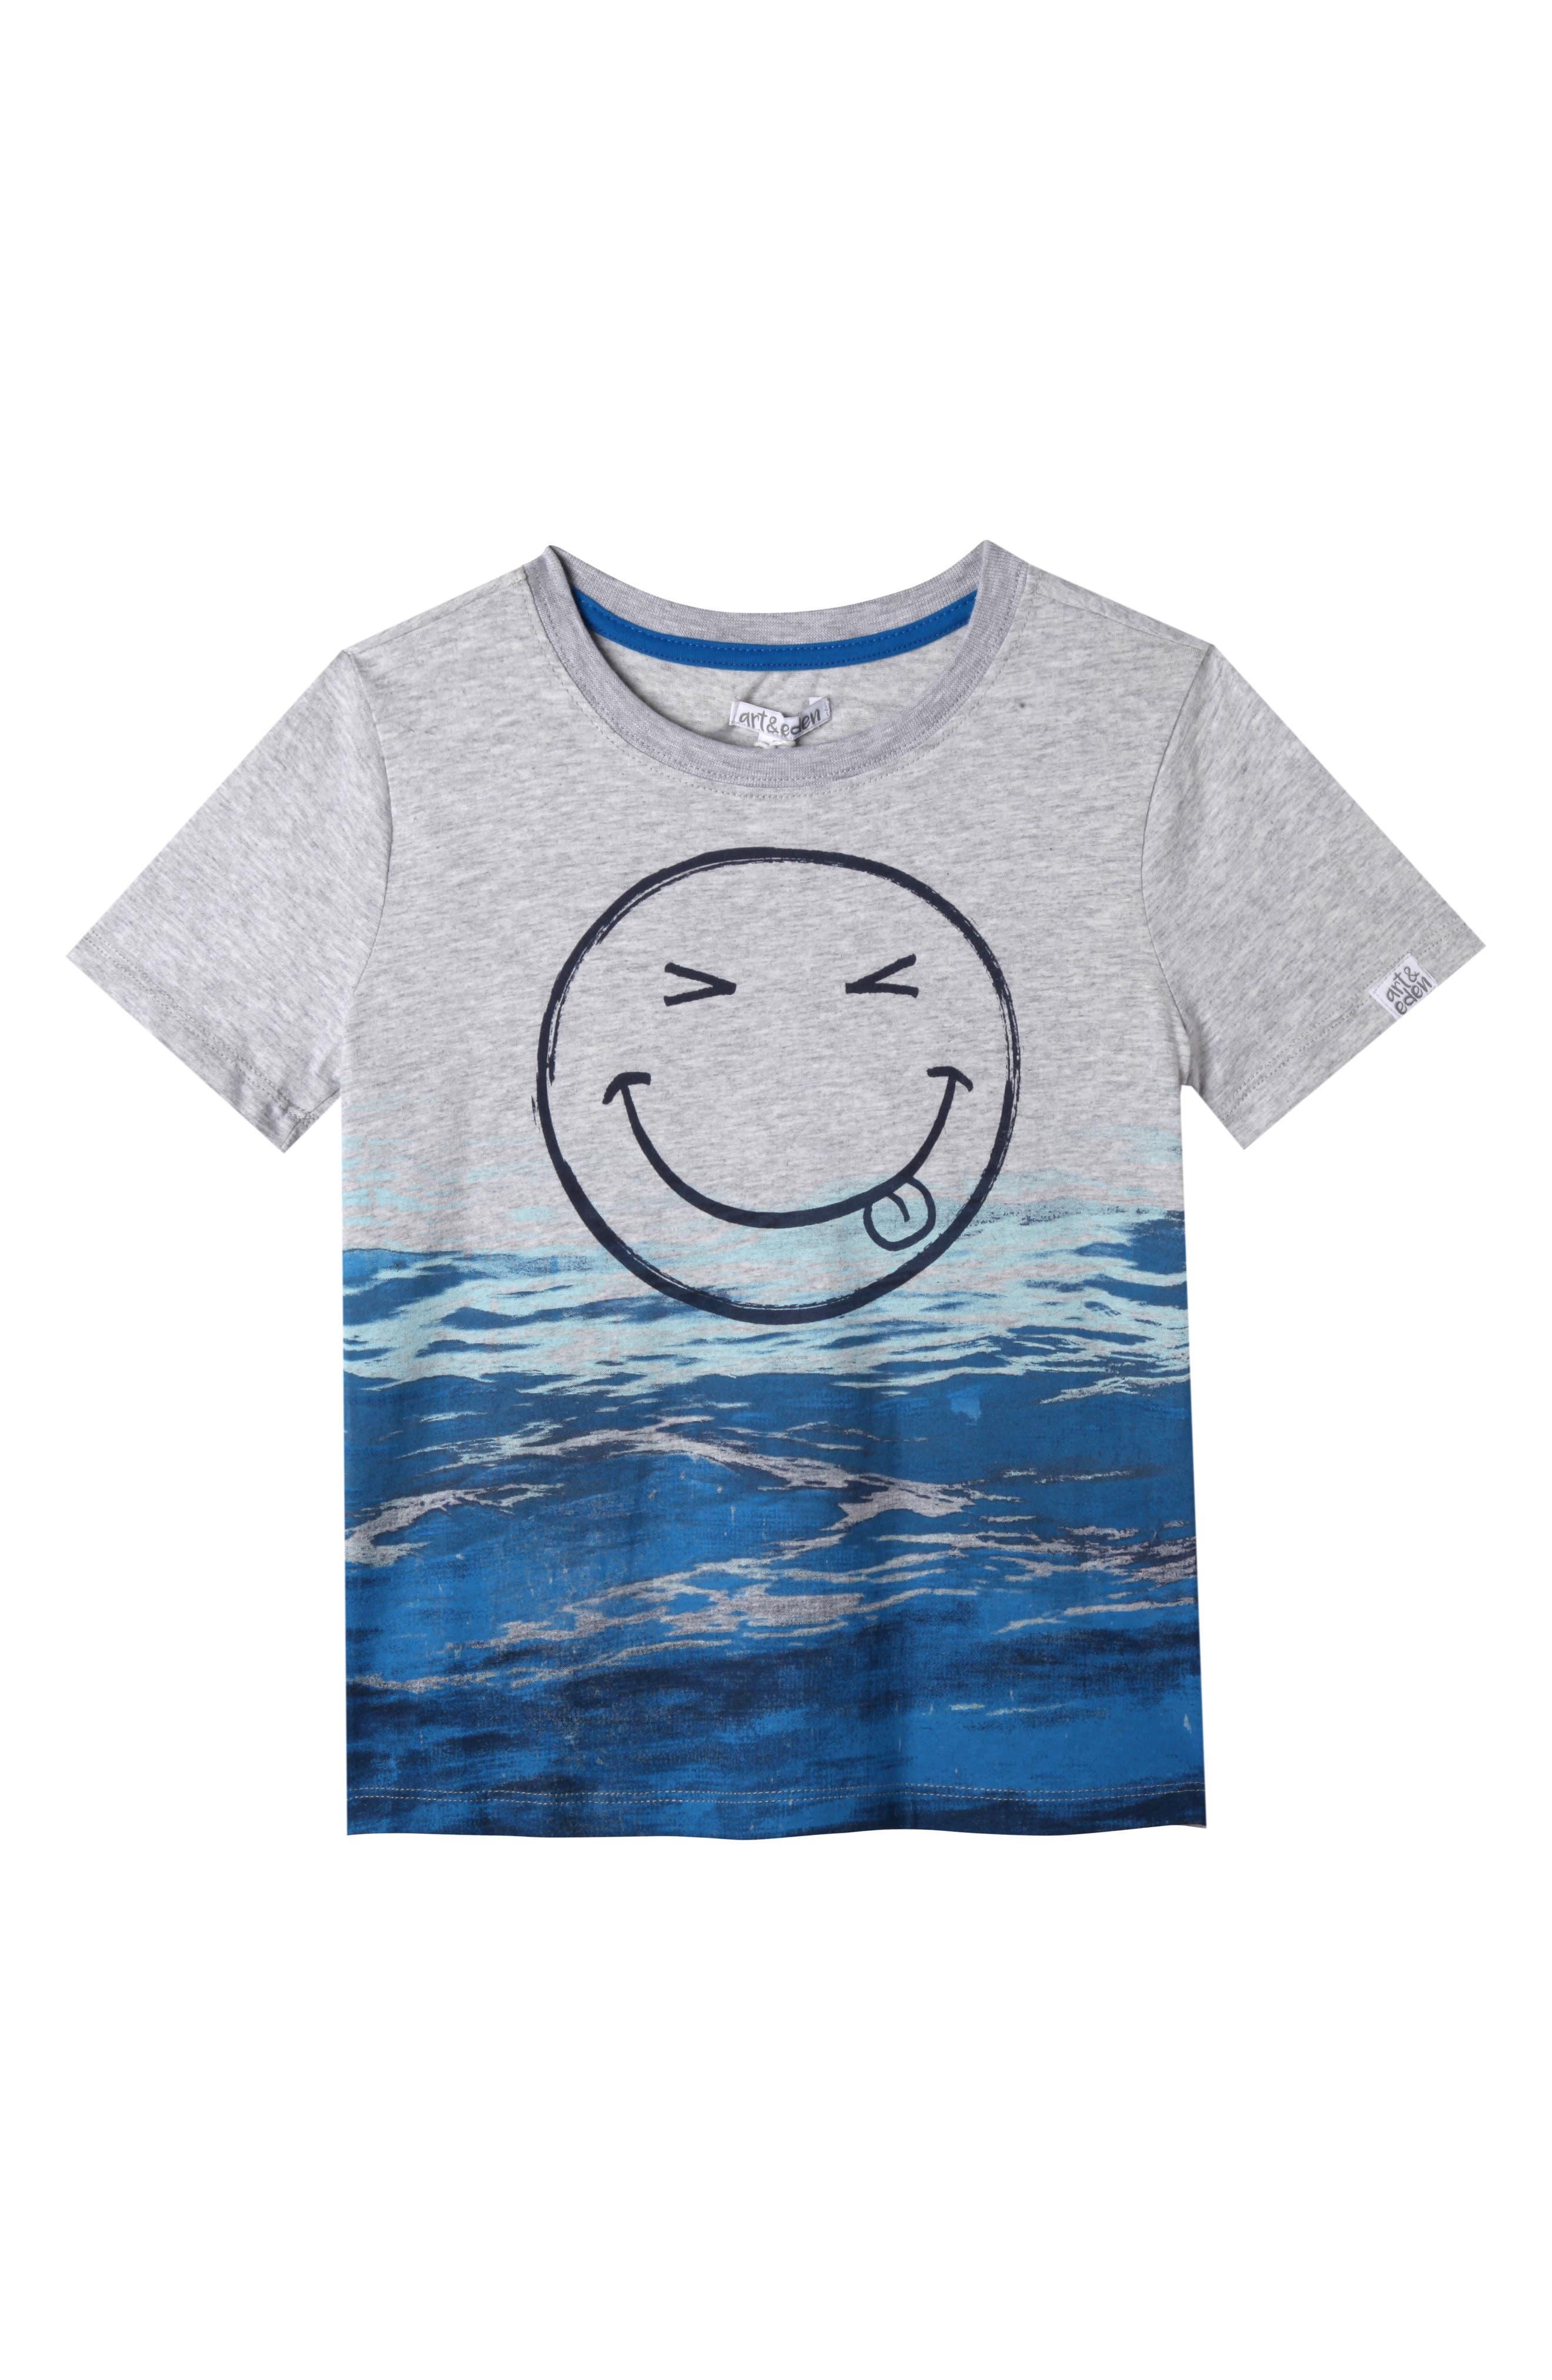 Olive Organic Cotton T-Shirt,                         Main,                         color, 031